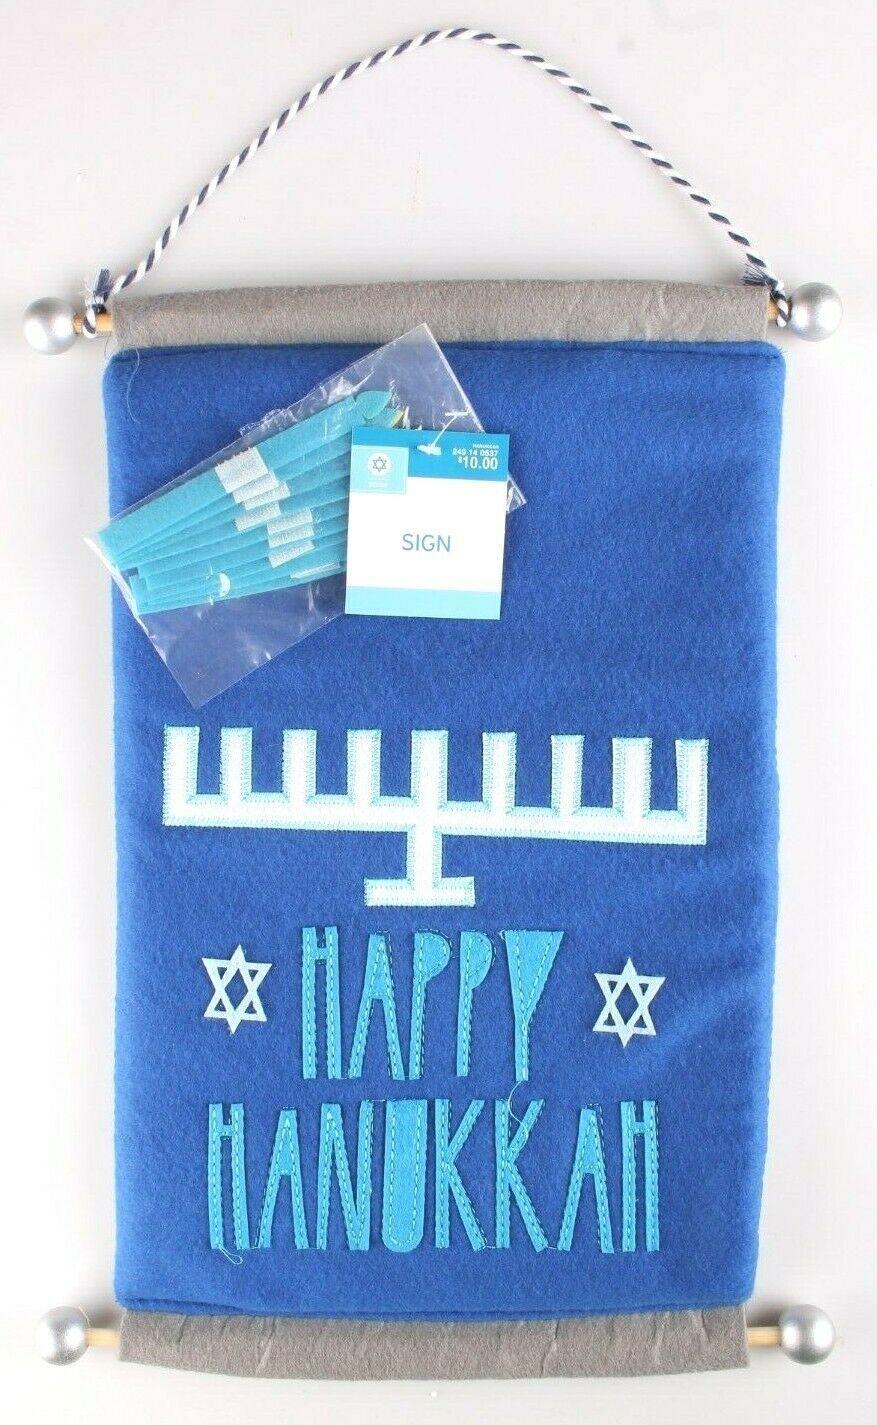 Happy Hanukkah Hanukiah Felt Banner Sign w Menorah & Stick on Candles Blue NEW